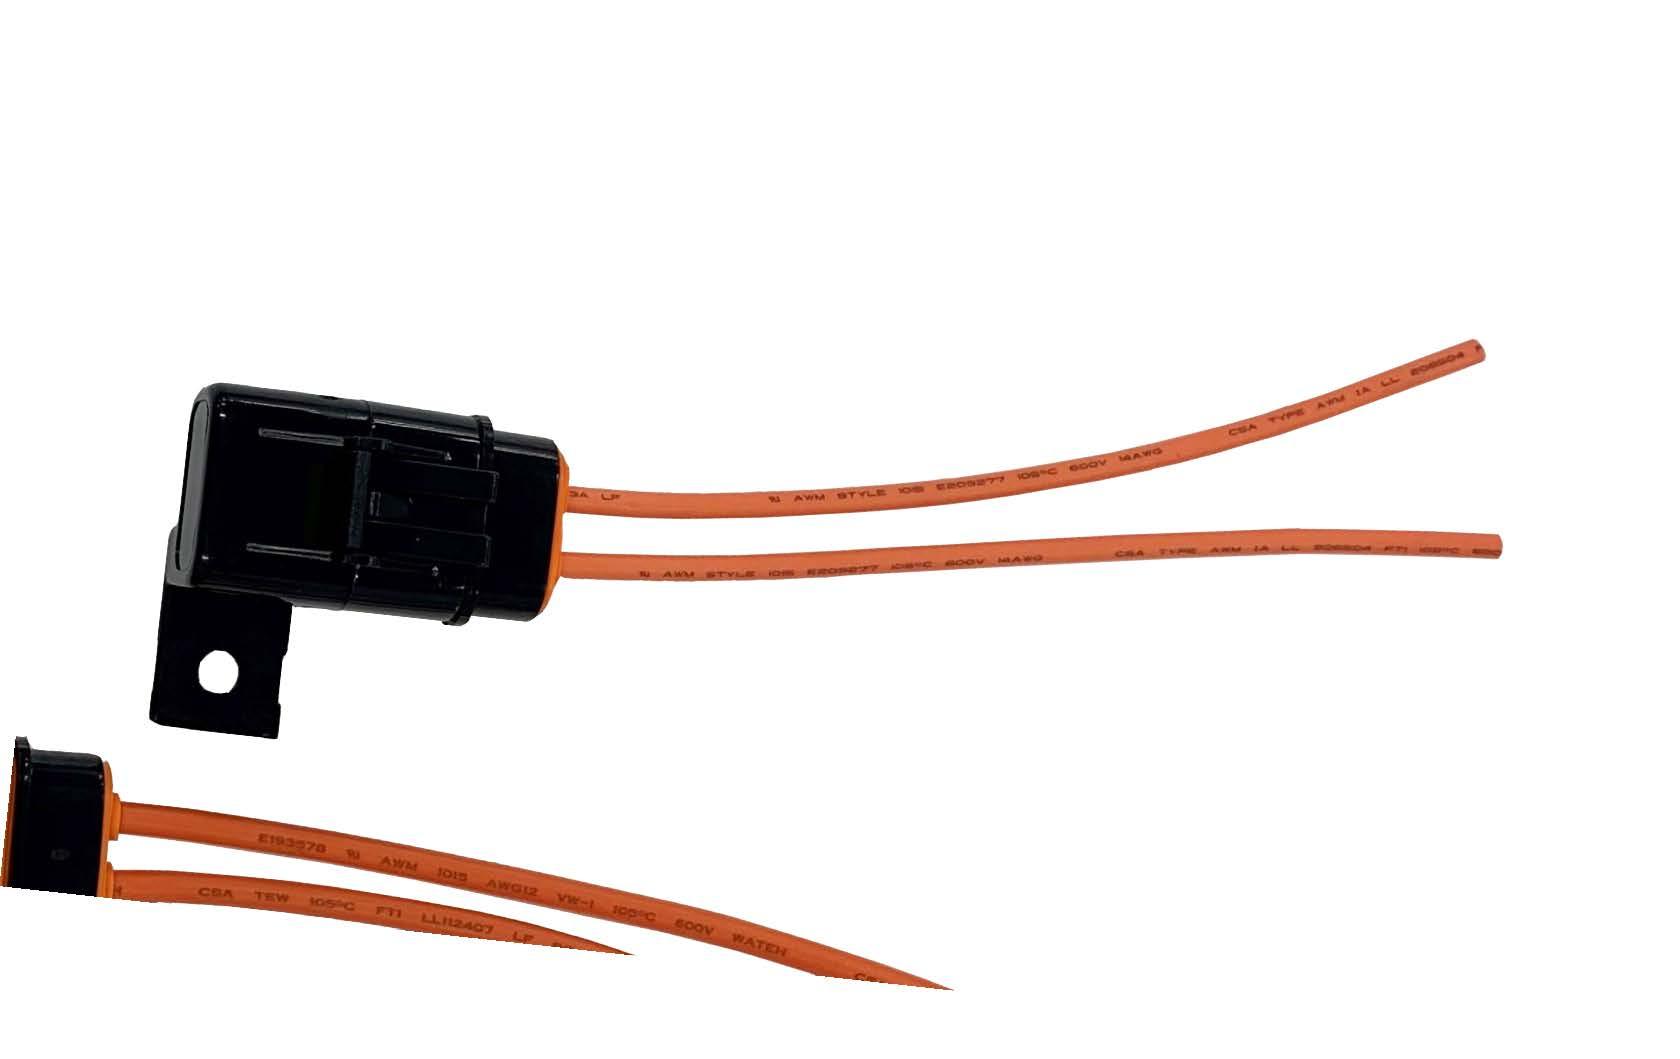 Fuse Holder - 12 ga Standard Fuse Waterproof 30 amp